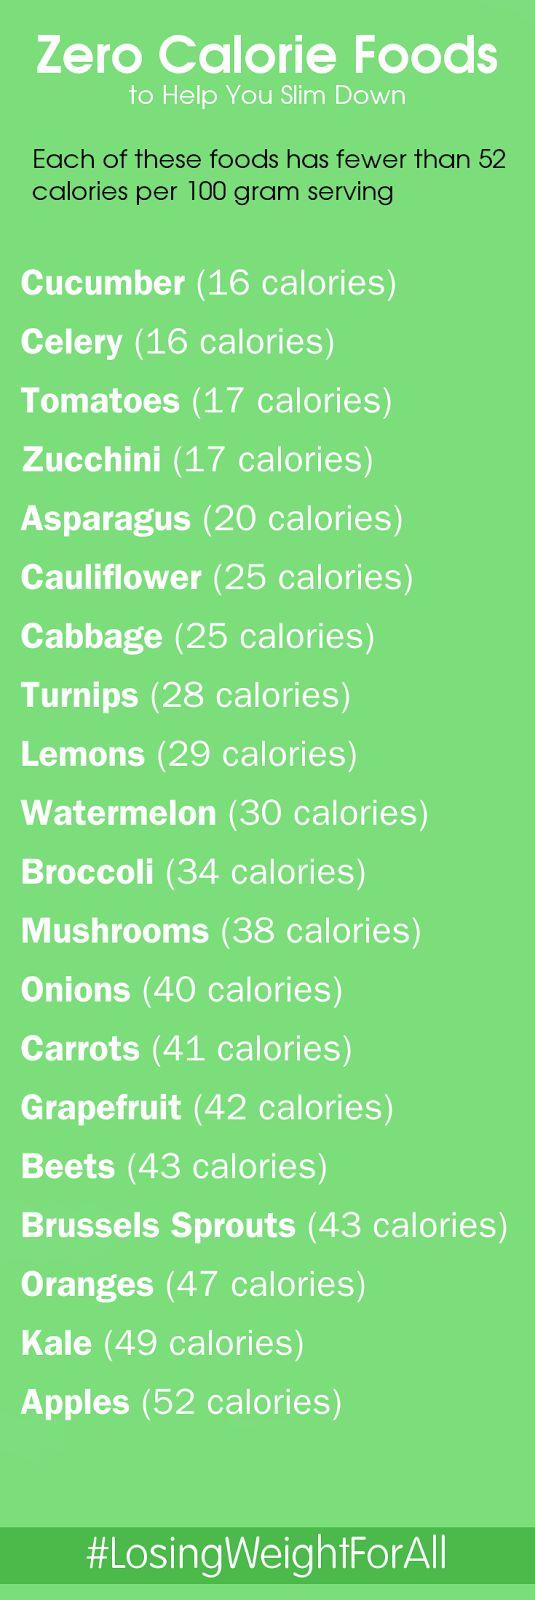 Calorie food chart list foodfash best 25 calorie chart ideas on vegetable nvjuhfo Image collections